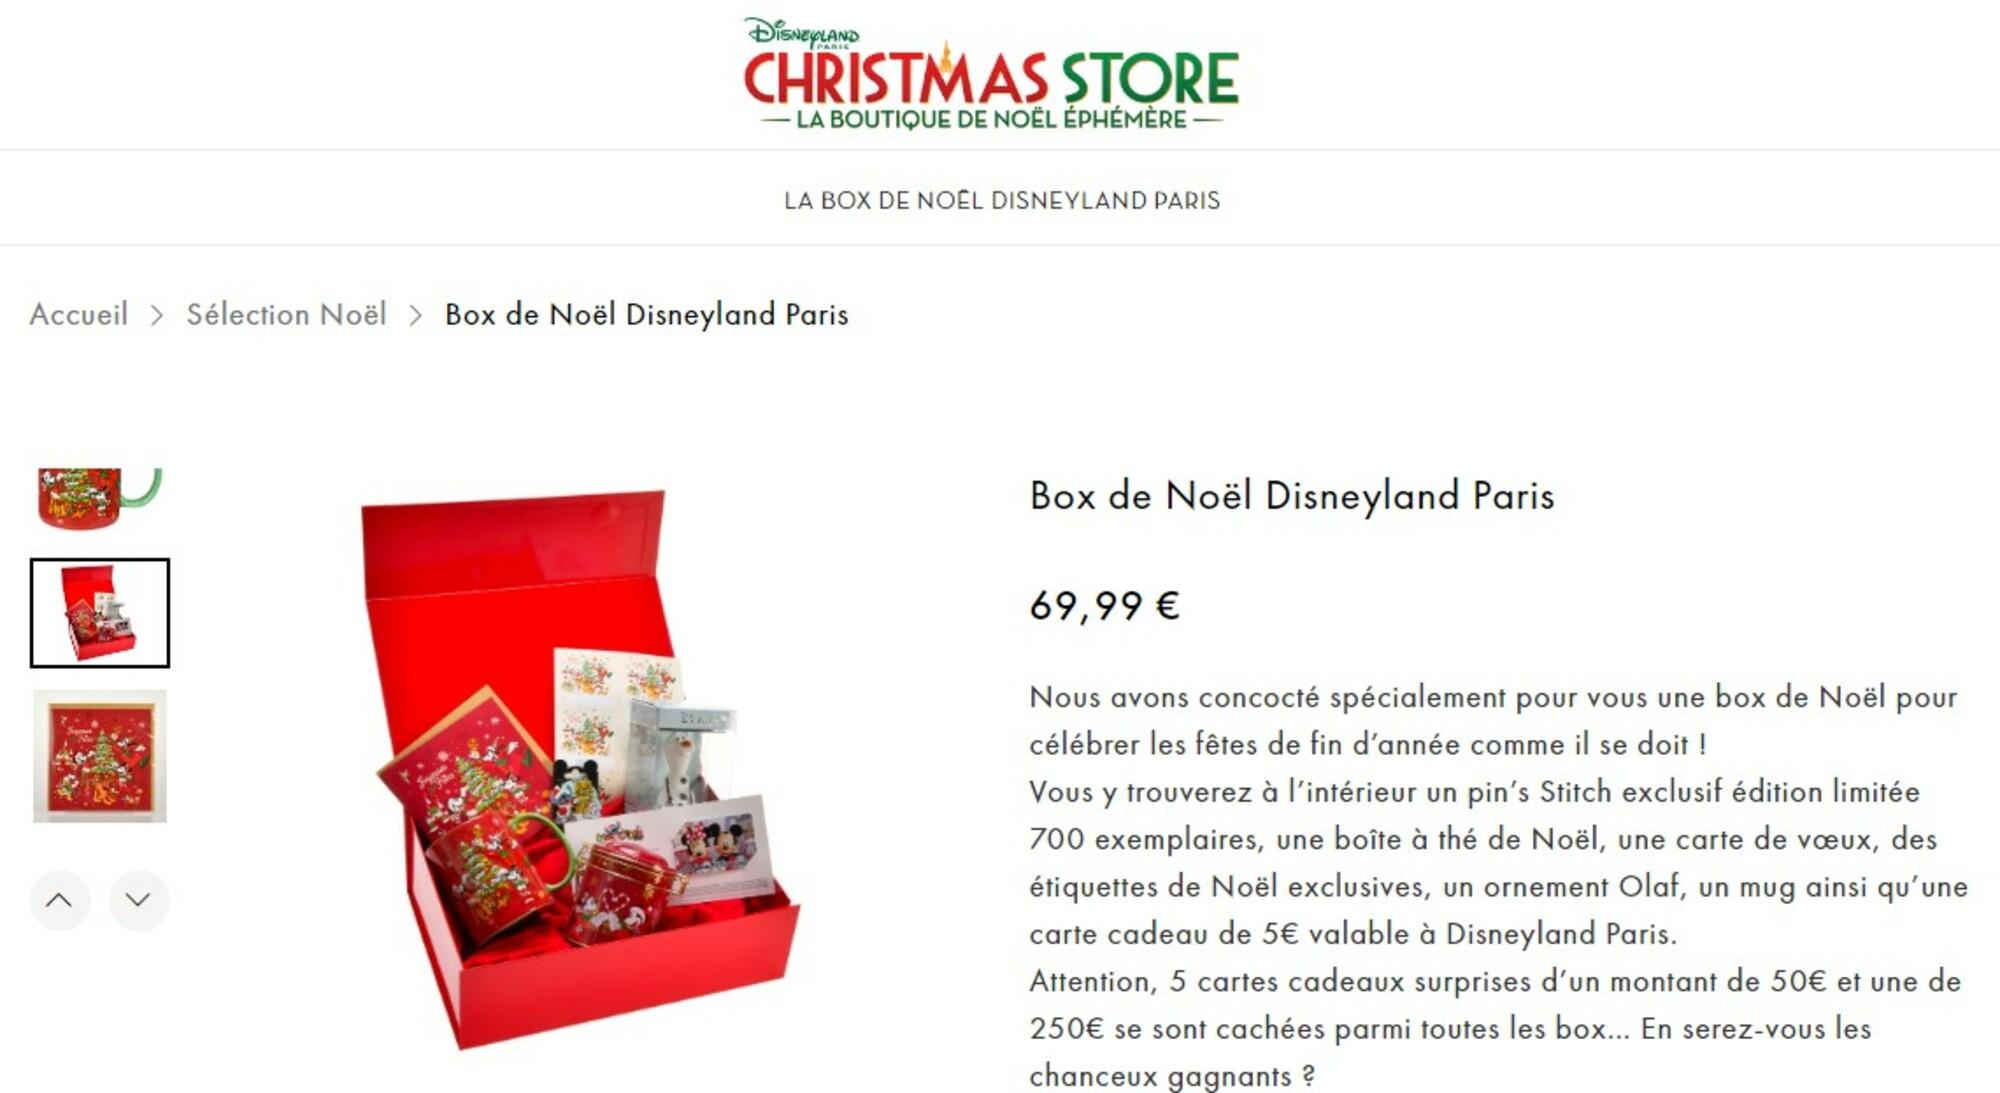 merchandising decembre 2020 disneyland paris